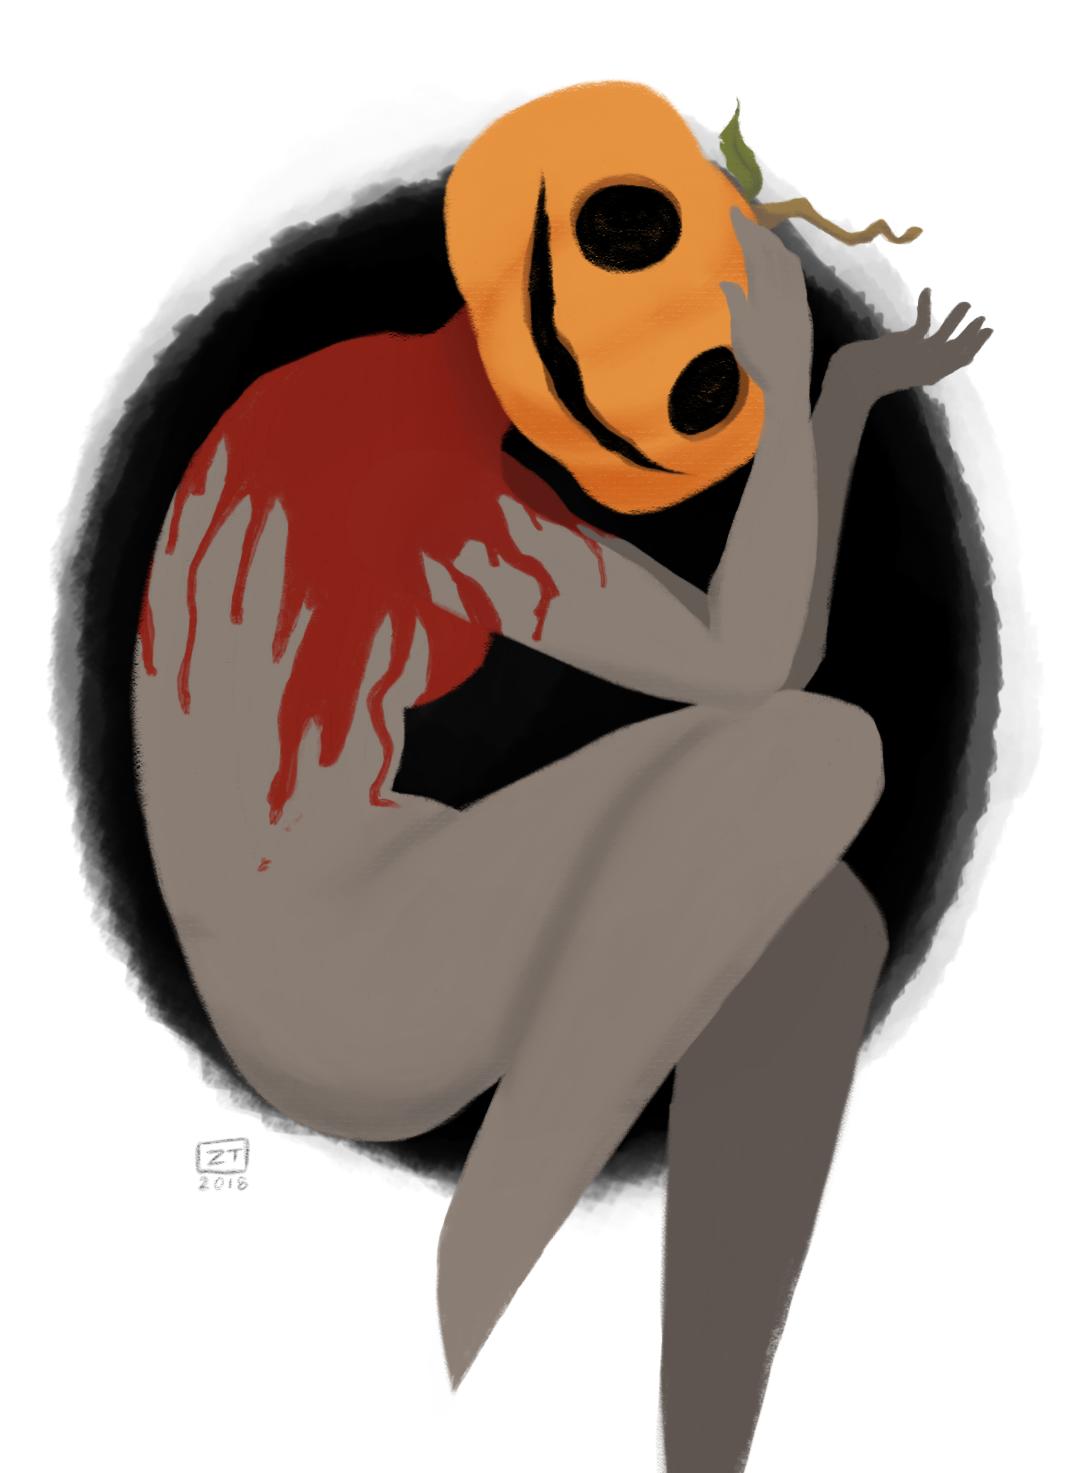 Pumpkin Girl Returns  Original Work   Autodesk Sketchbook, 2018